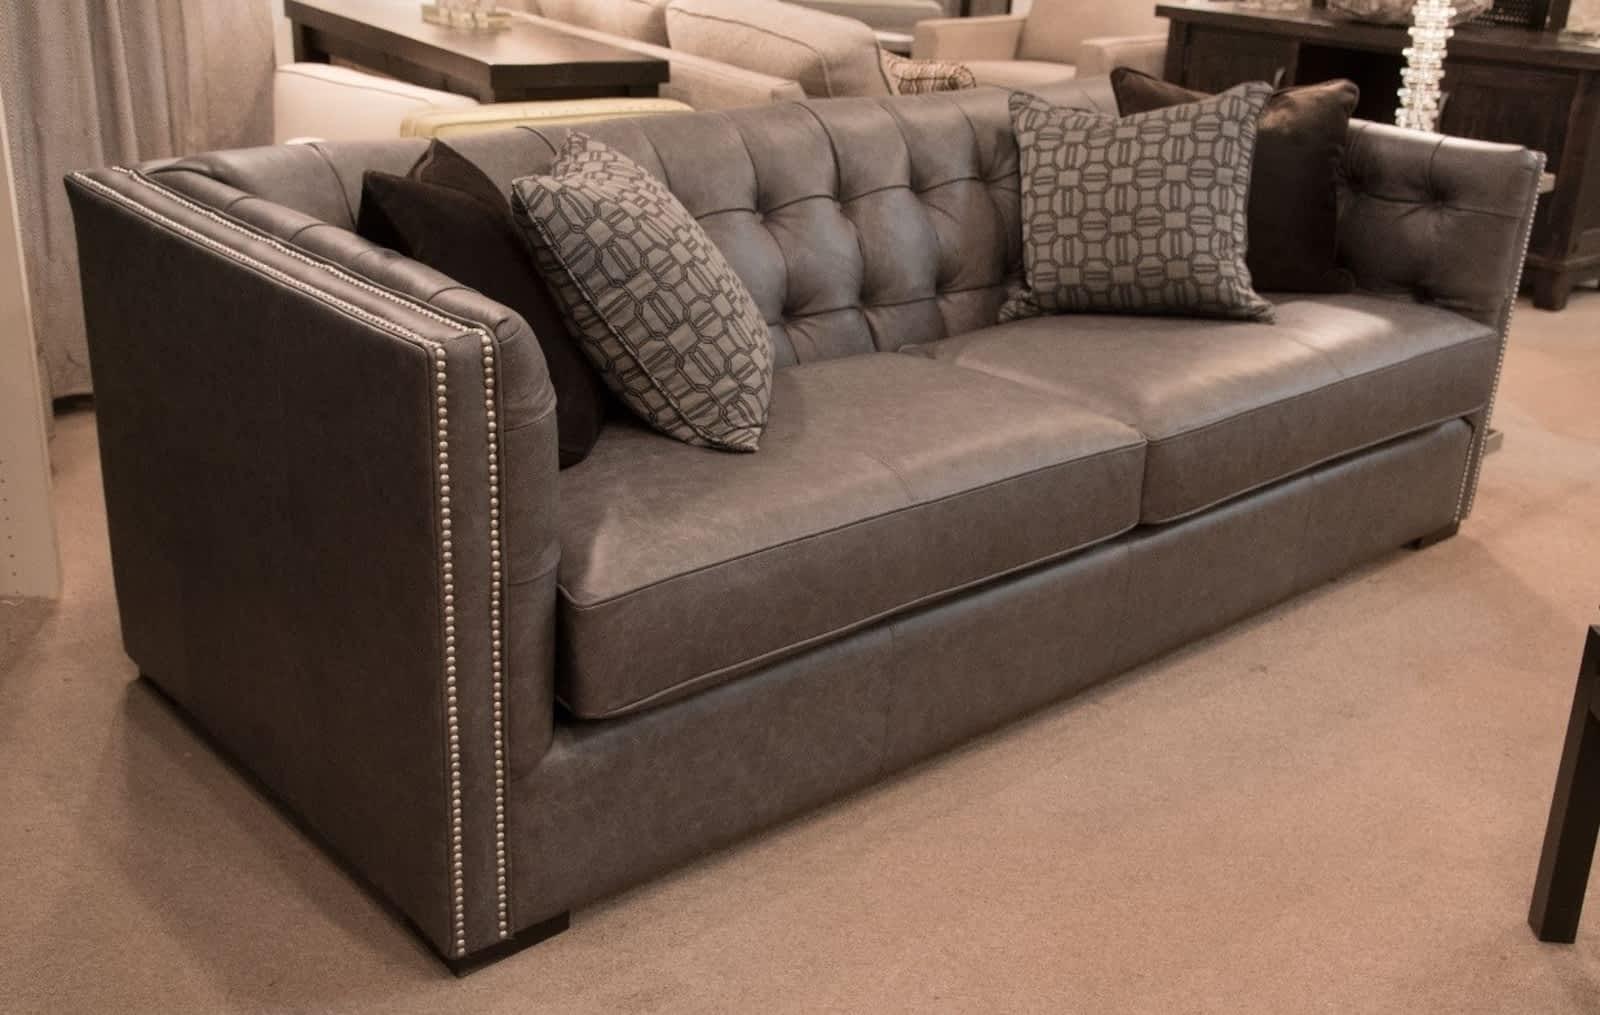 Joshua Creek Trading Furniture U0026 Home Decor   Opening Hours   1029 Speers  Rd, Oakville, ON